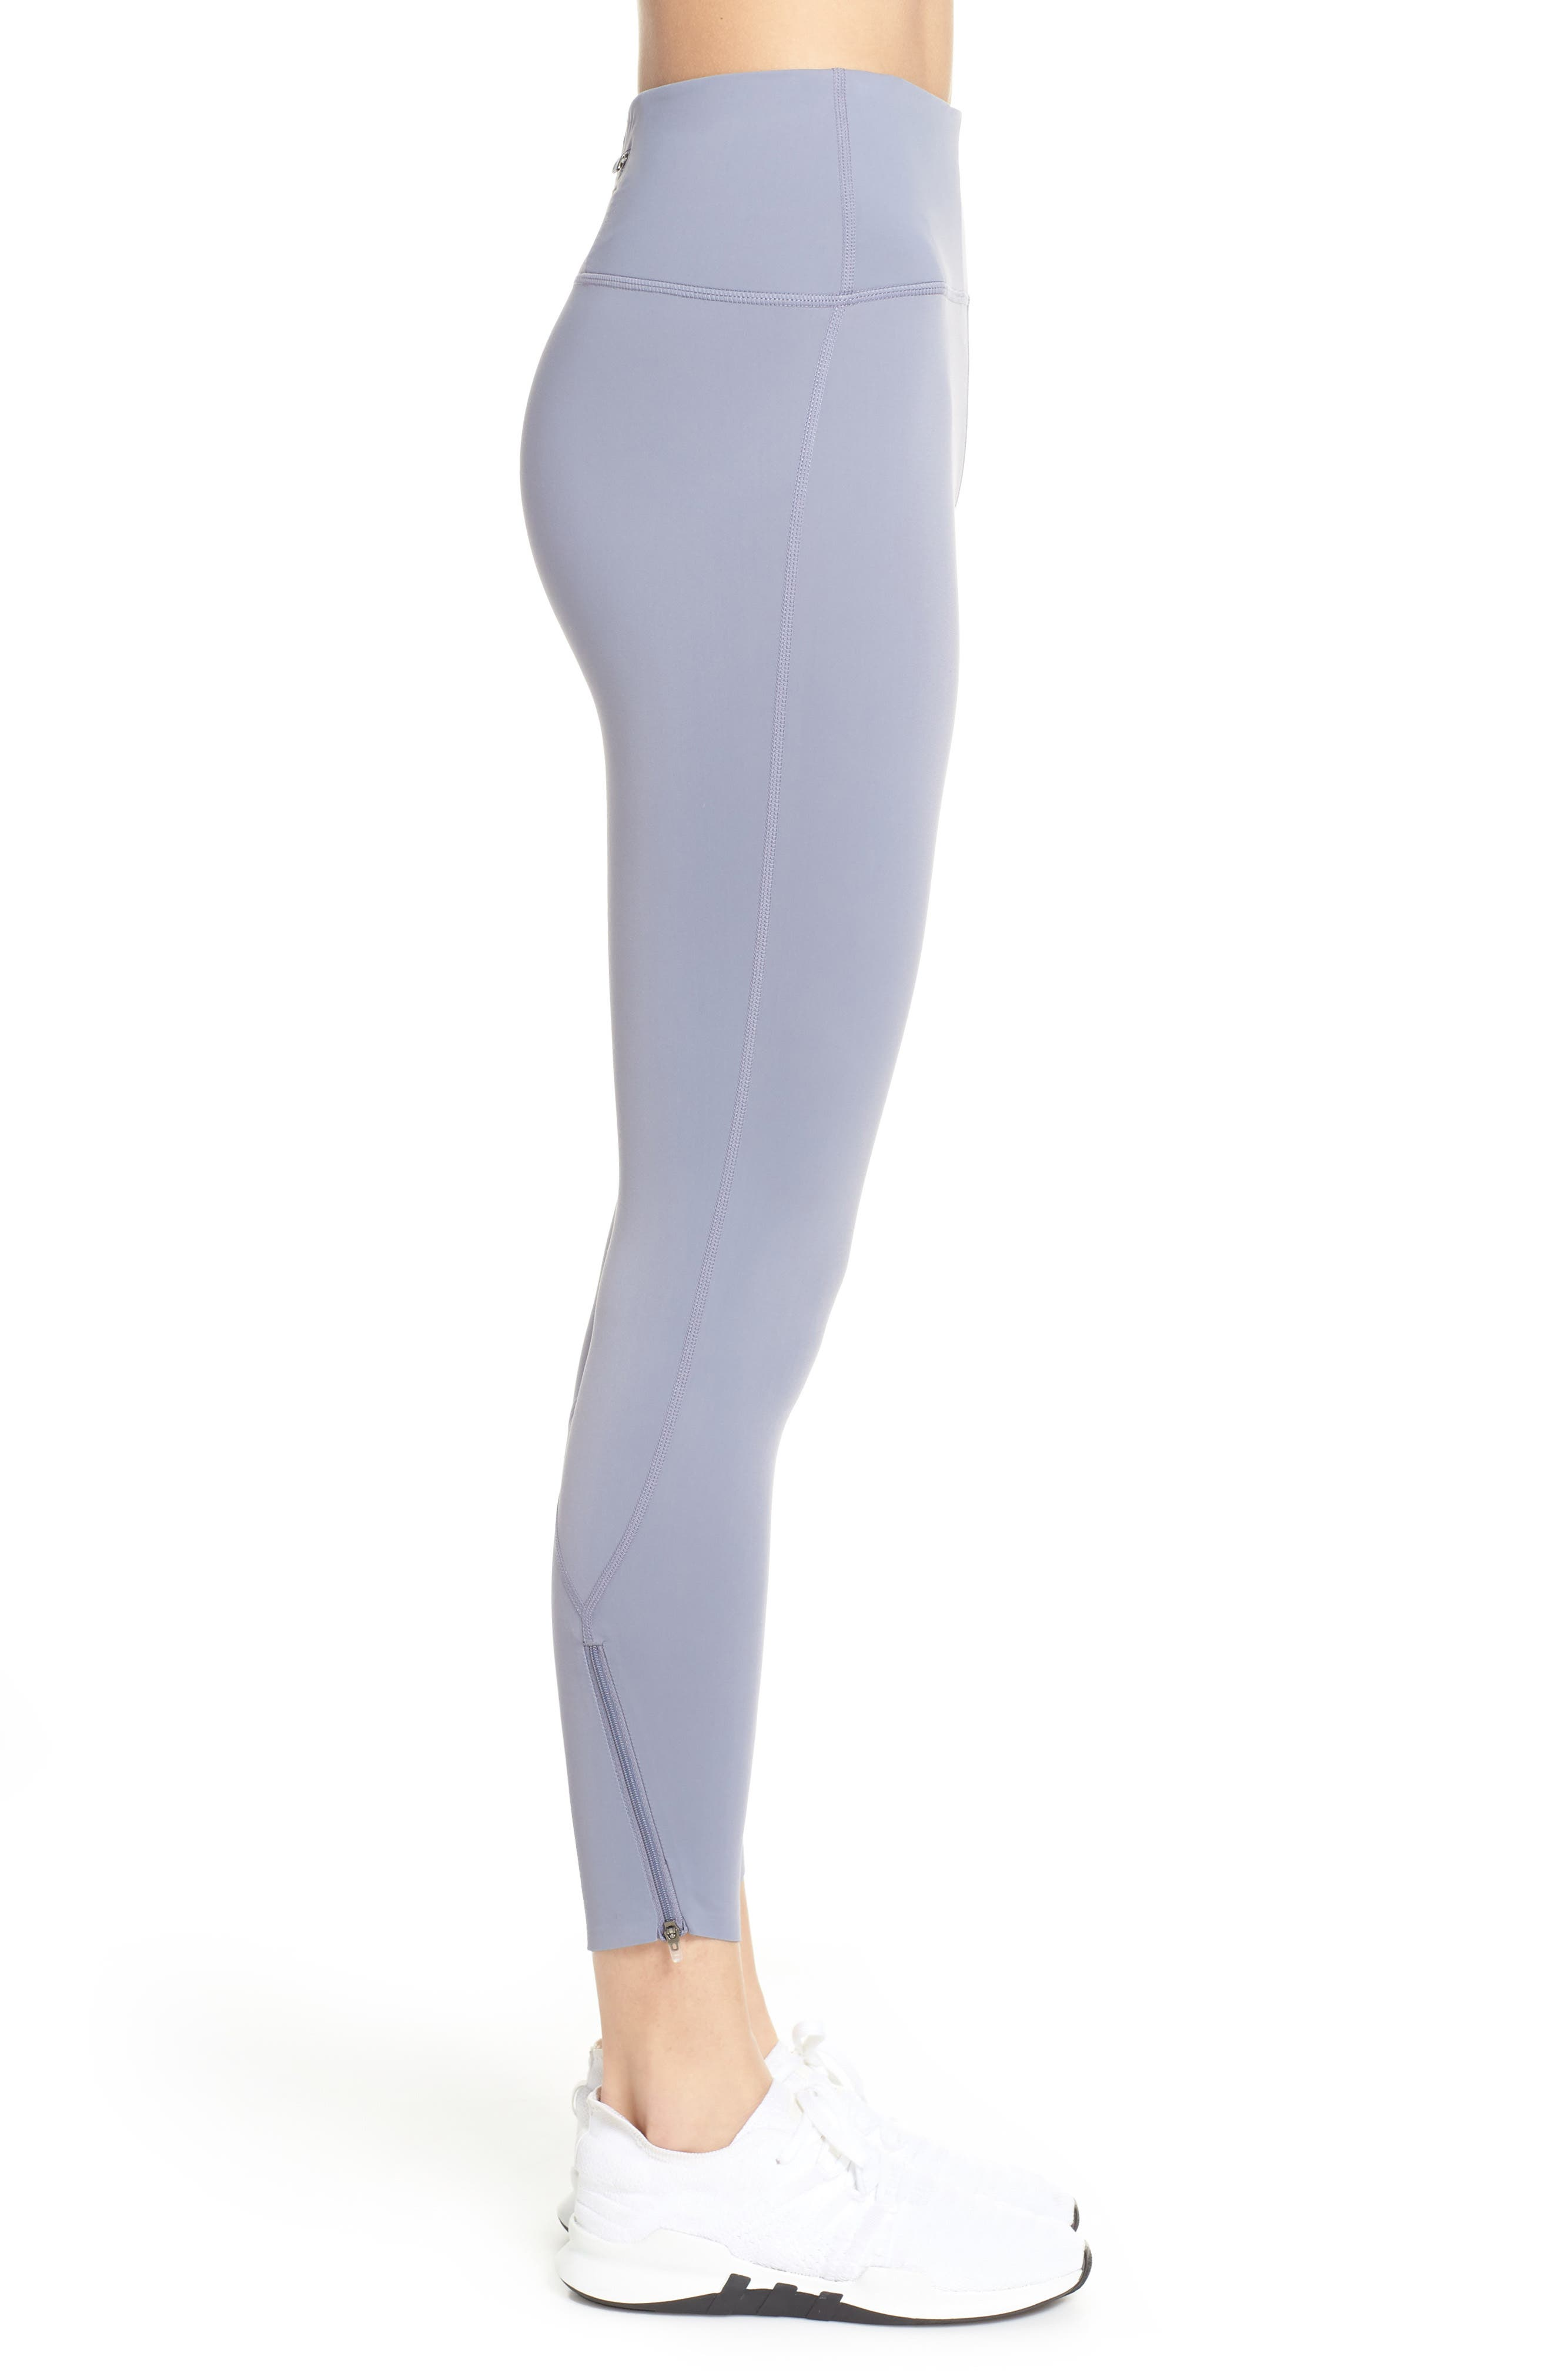 ZELLA, Luella Luxe High Waist 7/8 Leggings, Alternate thumbnail 4, color, GREY GRANITE